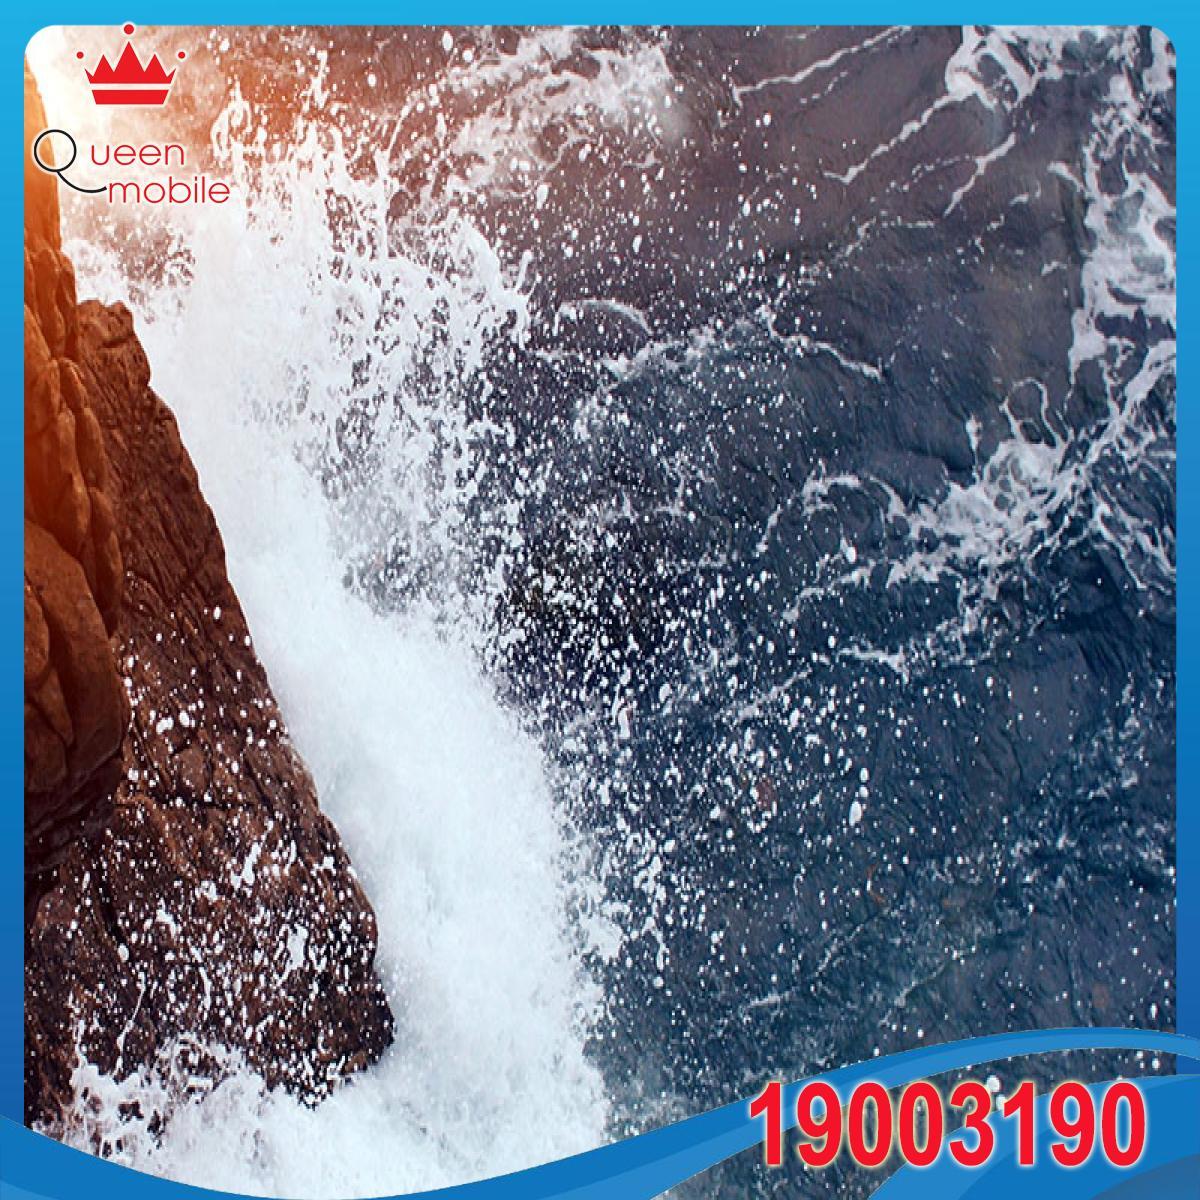 rock-wave-sea-ocean-nature-blue-flare-imac-27